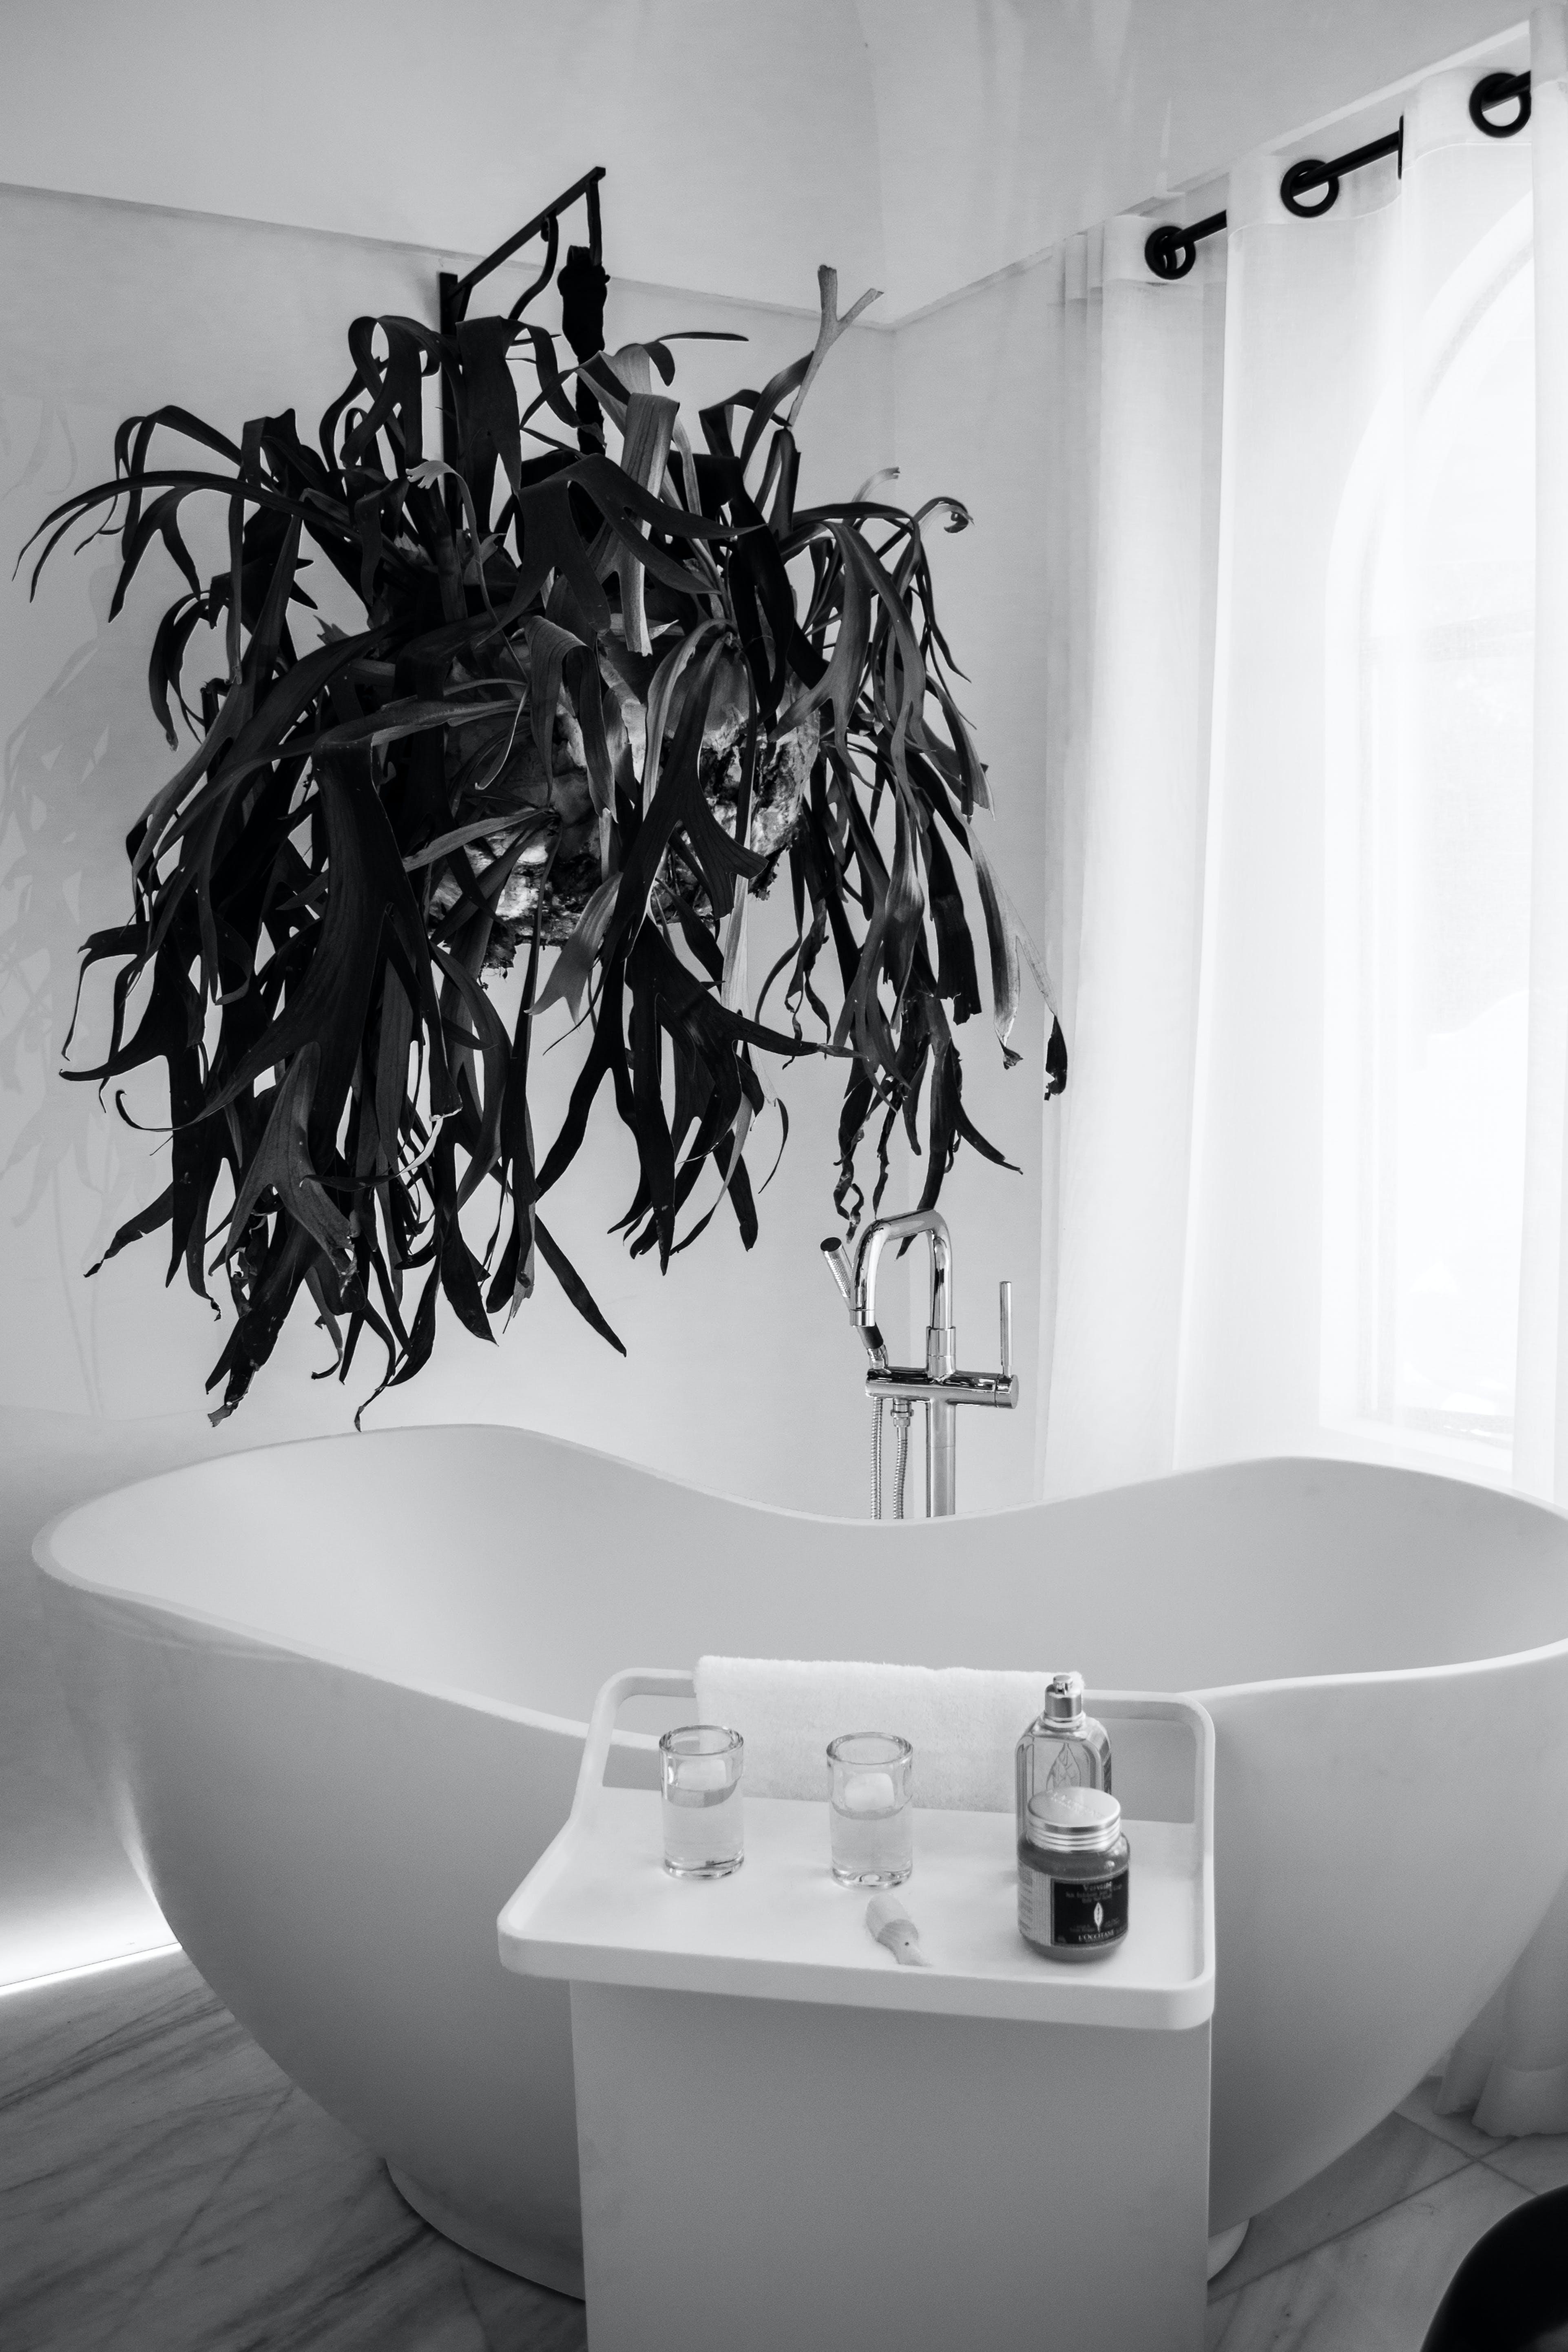 Grayscale Photography of Bathtub Near Window